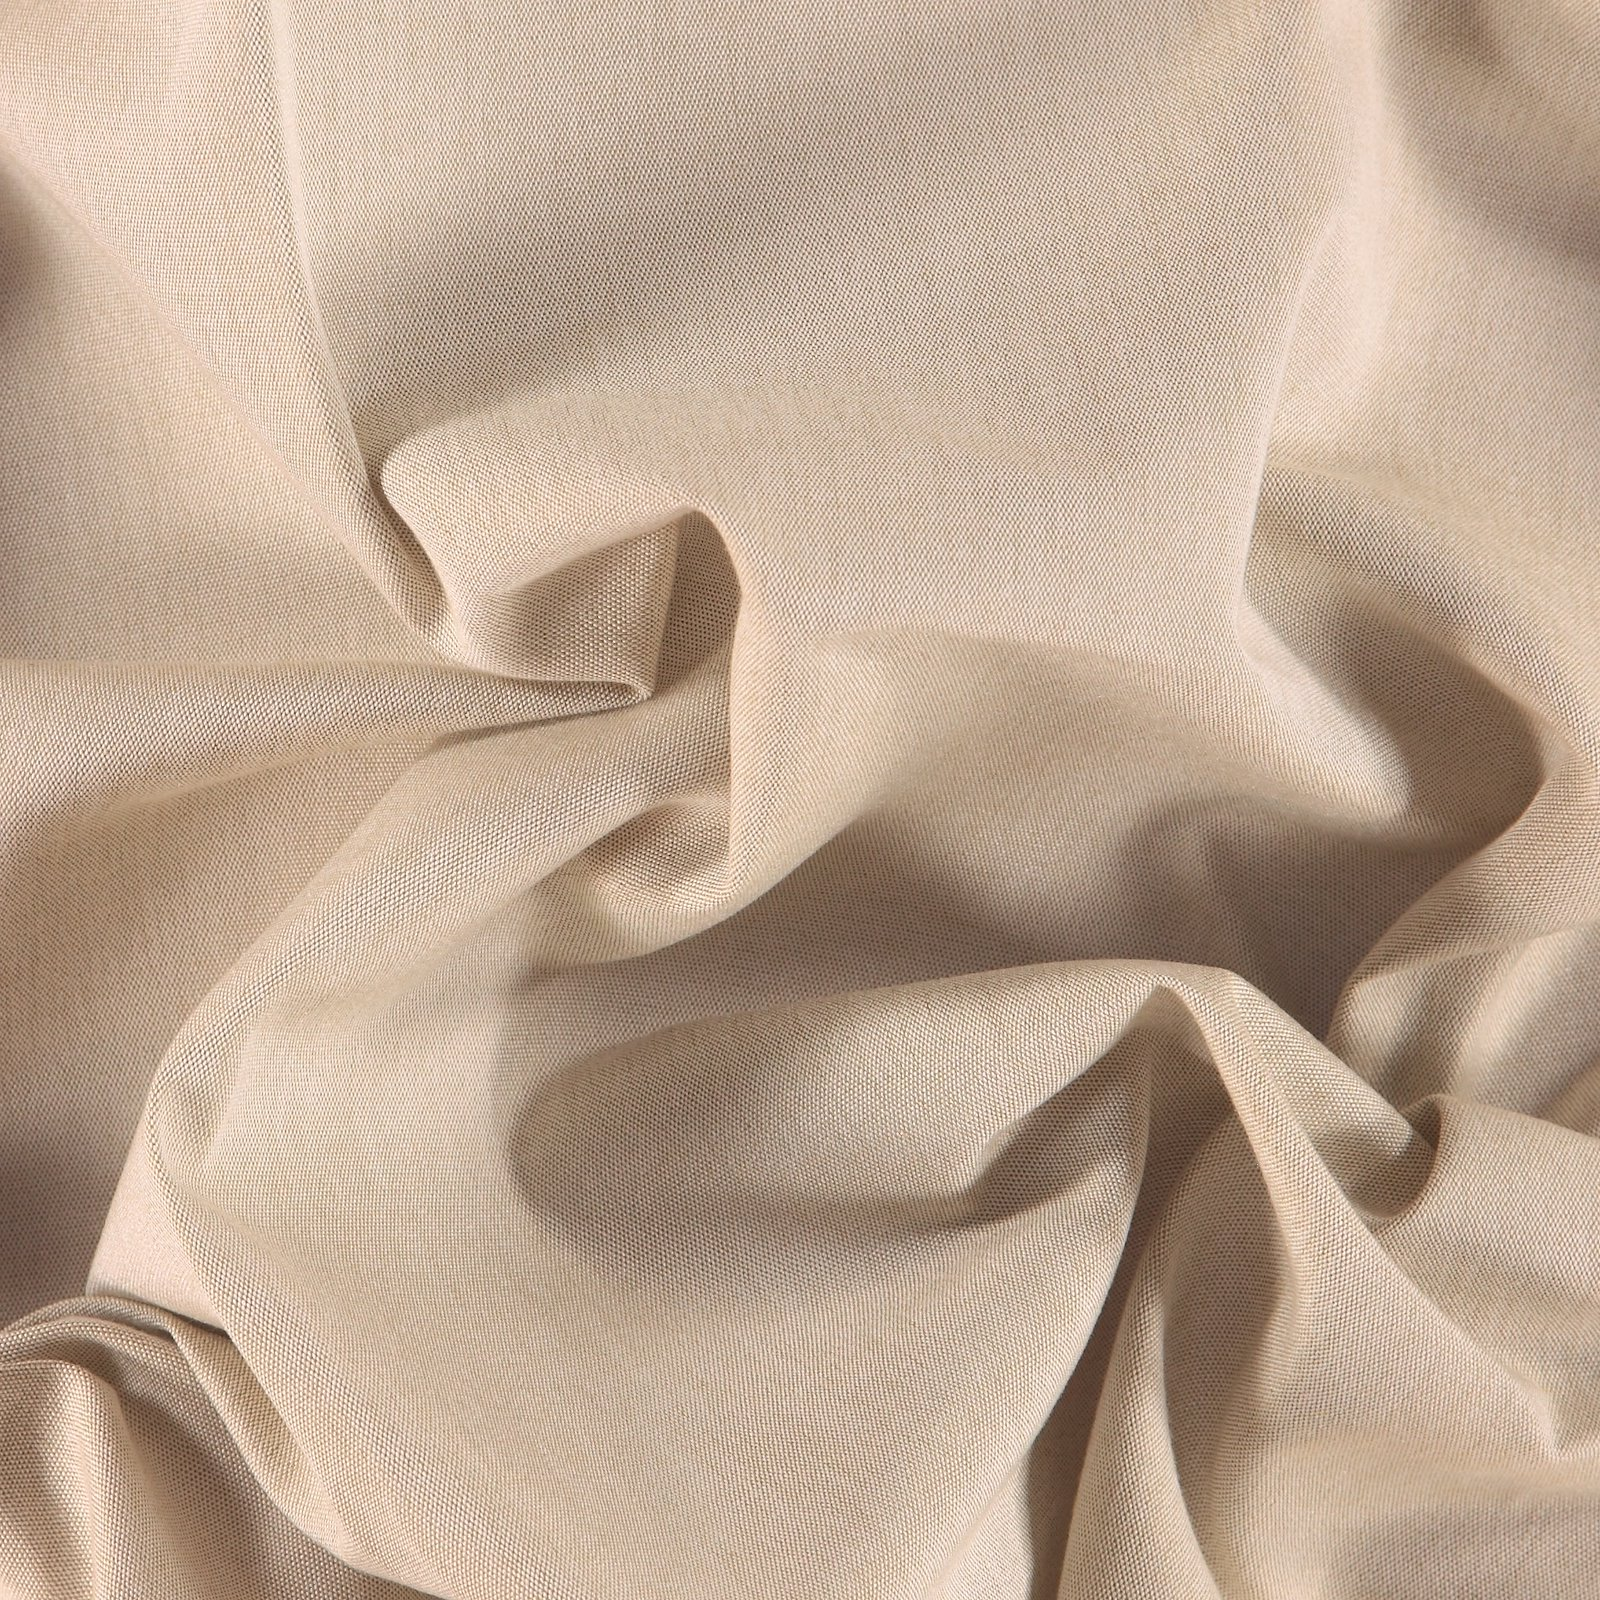 Dralon linen look, water repellent Teflo